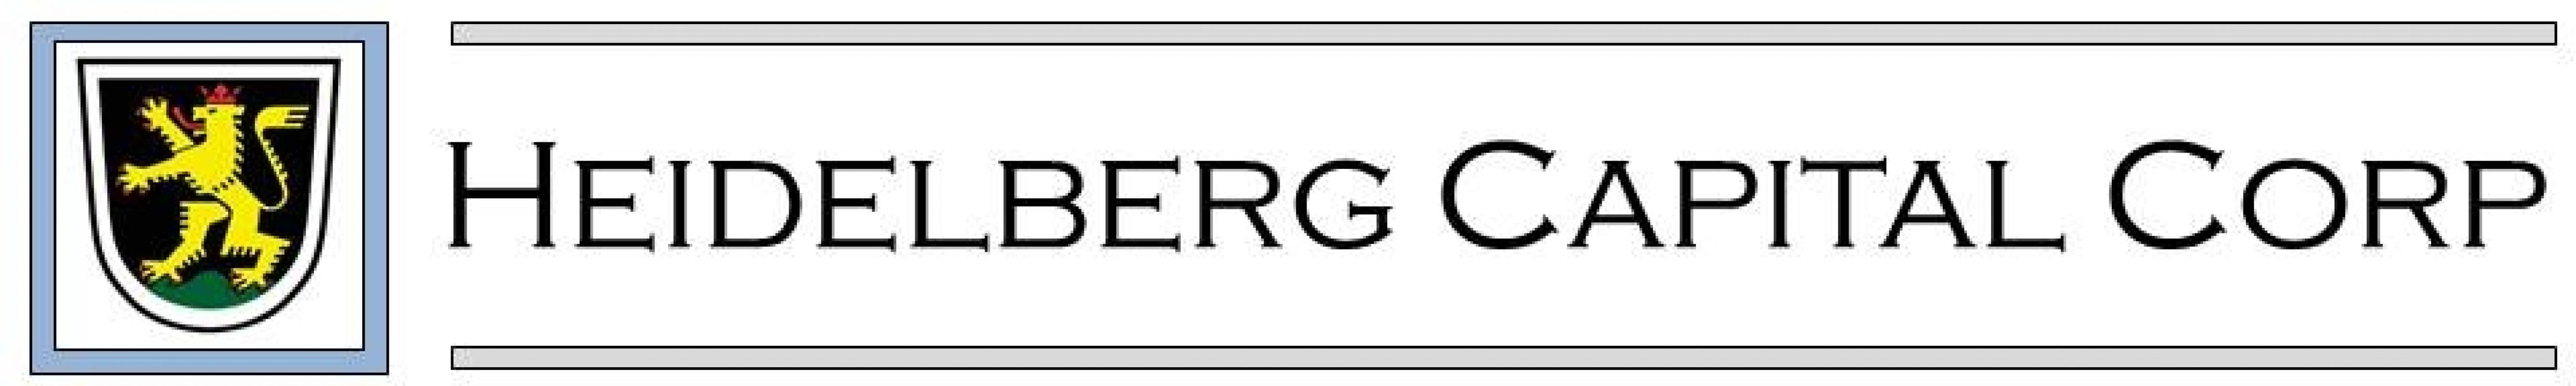 Heidelberg Capital Corp